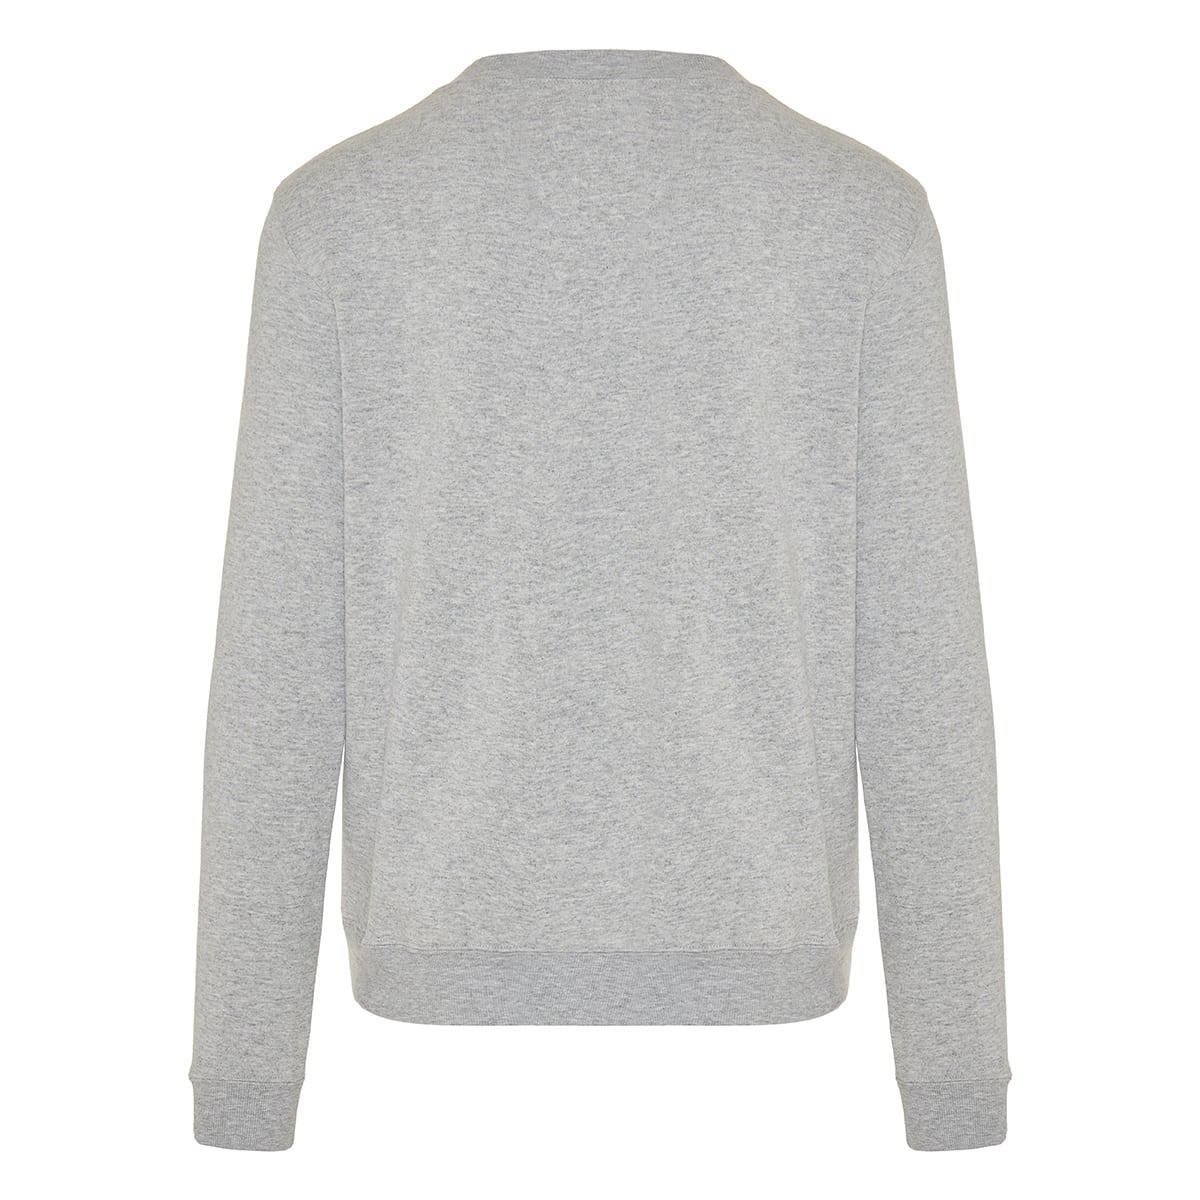 Saint Laurent Snoopy cotton sweatshirt